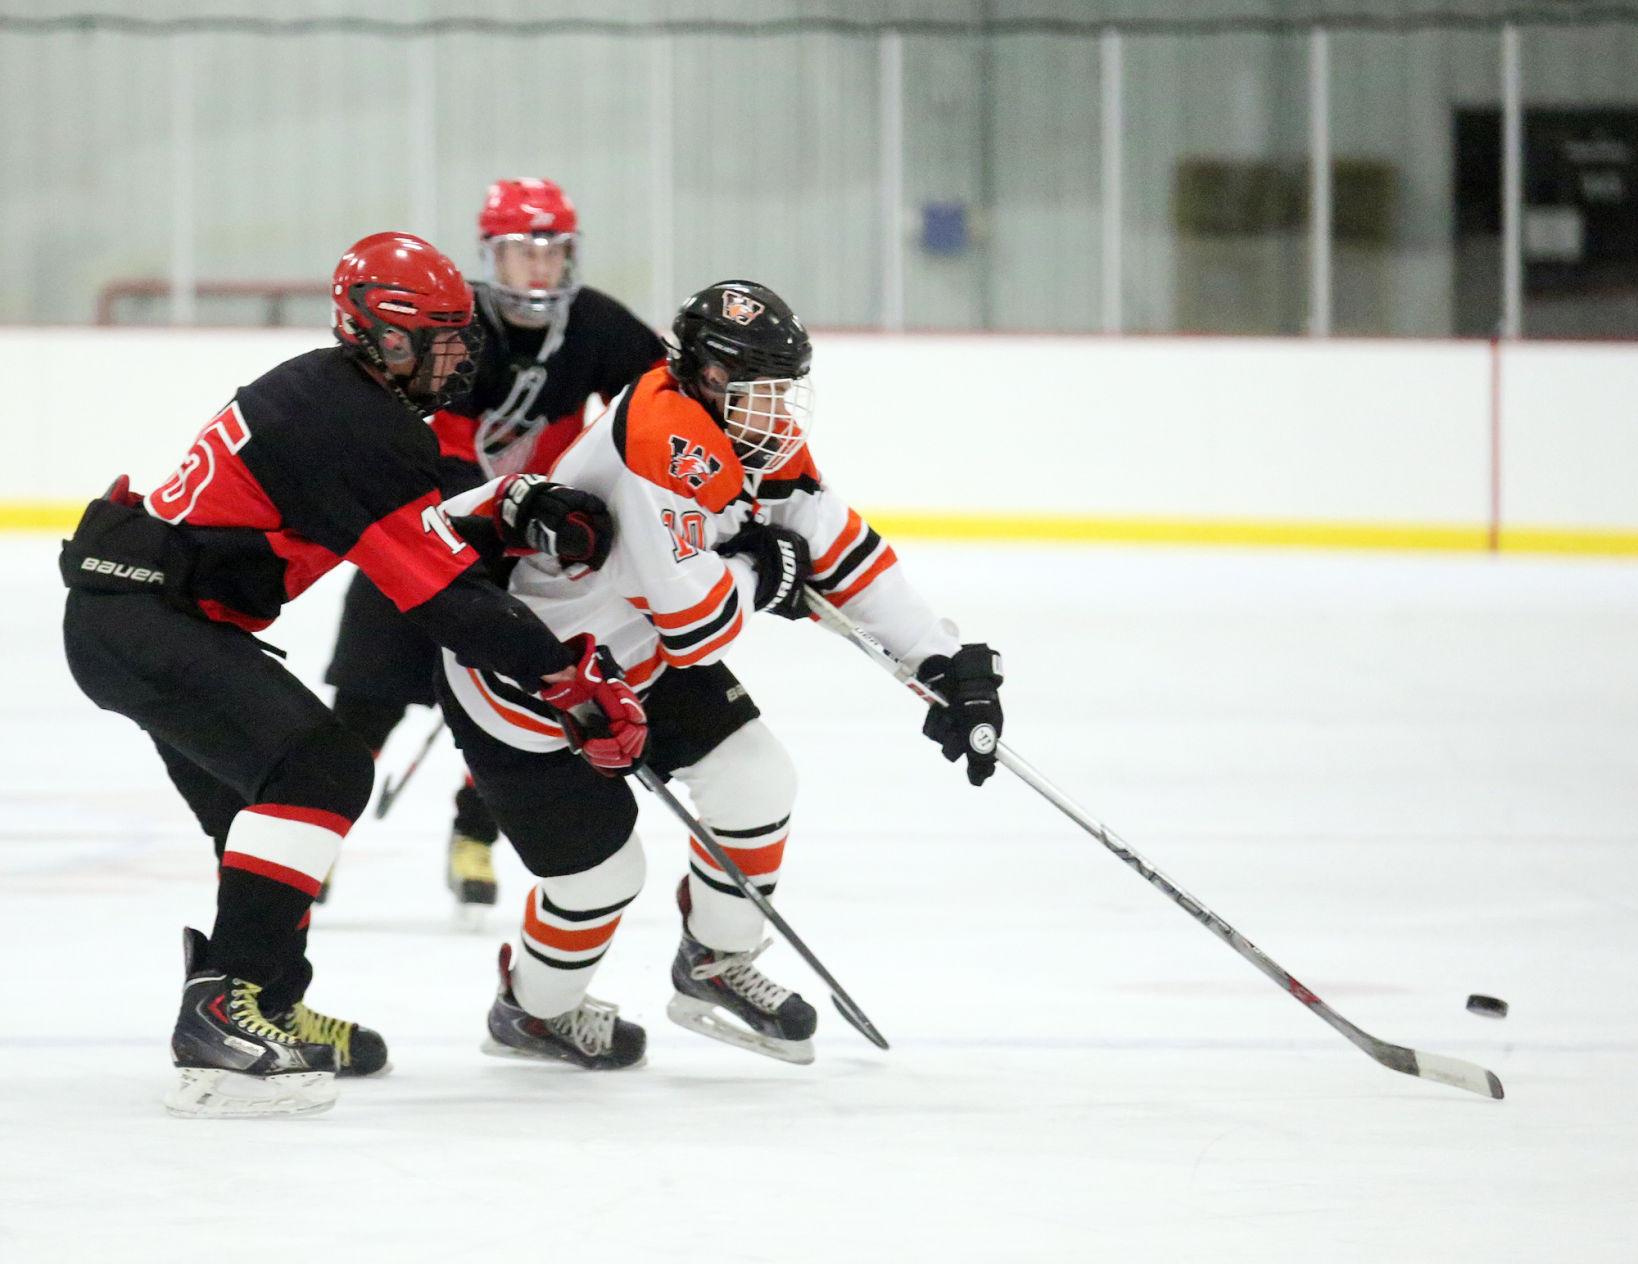 MN H.S.: Mannor, Winona Boys Hockey Team Win Again